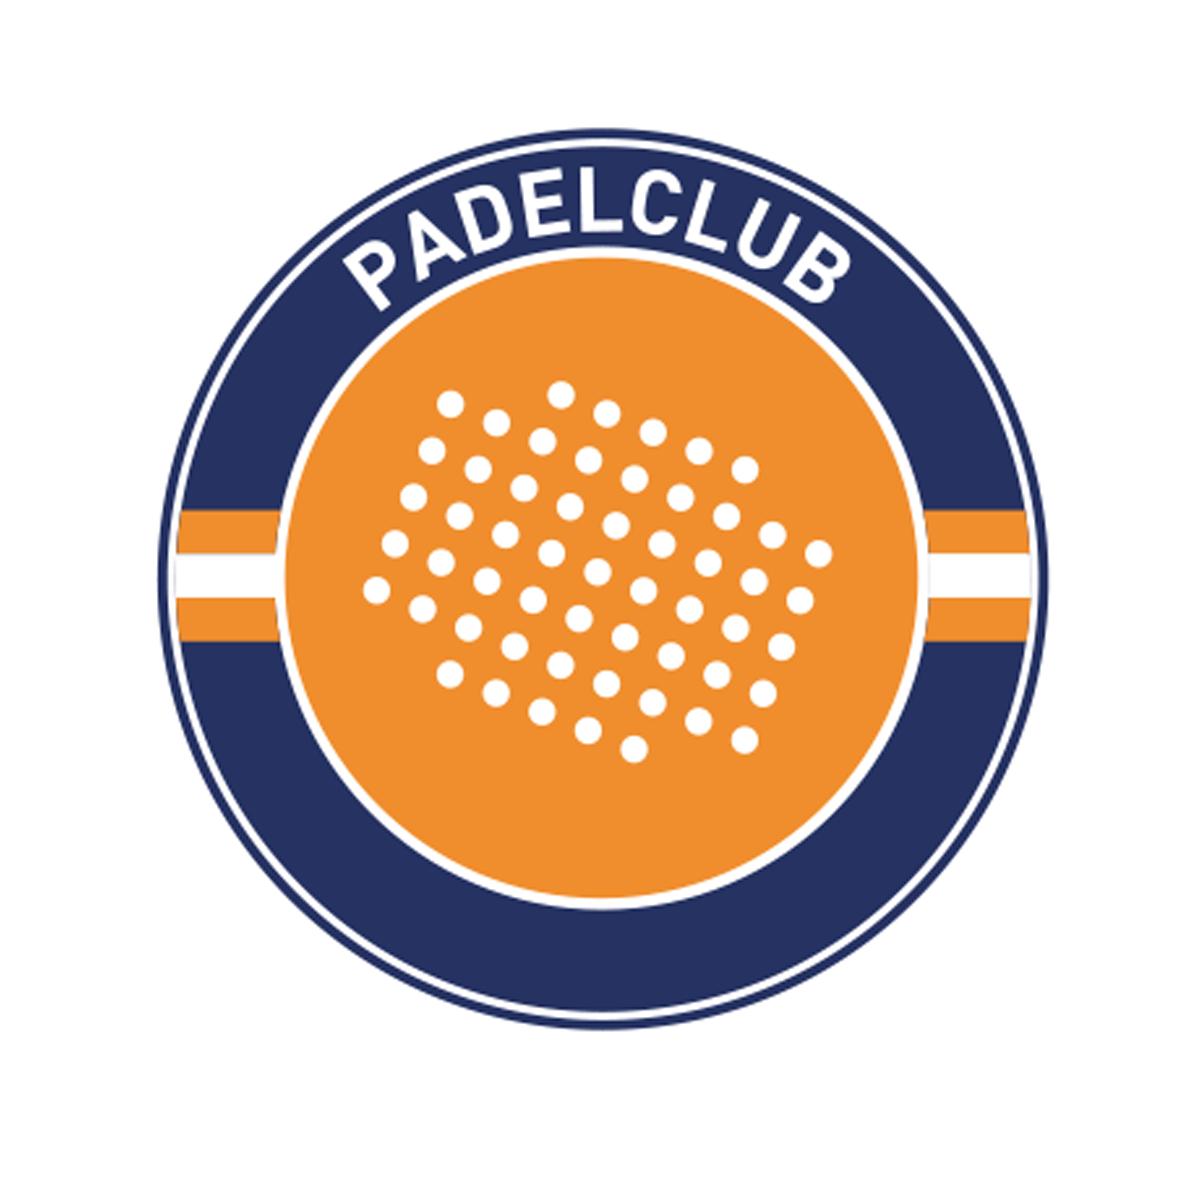 Padelclub